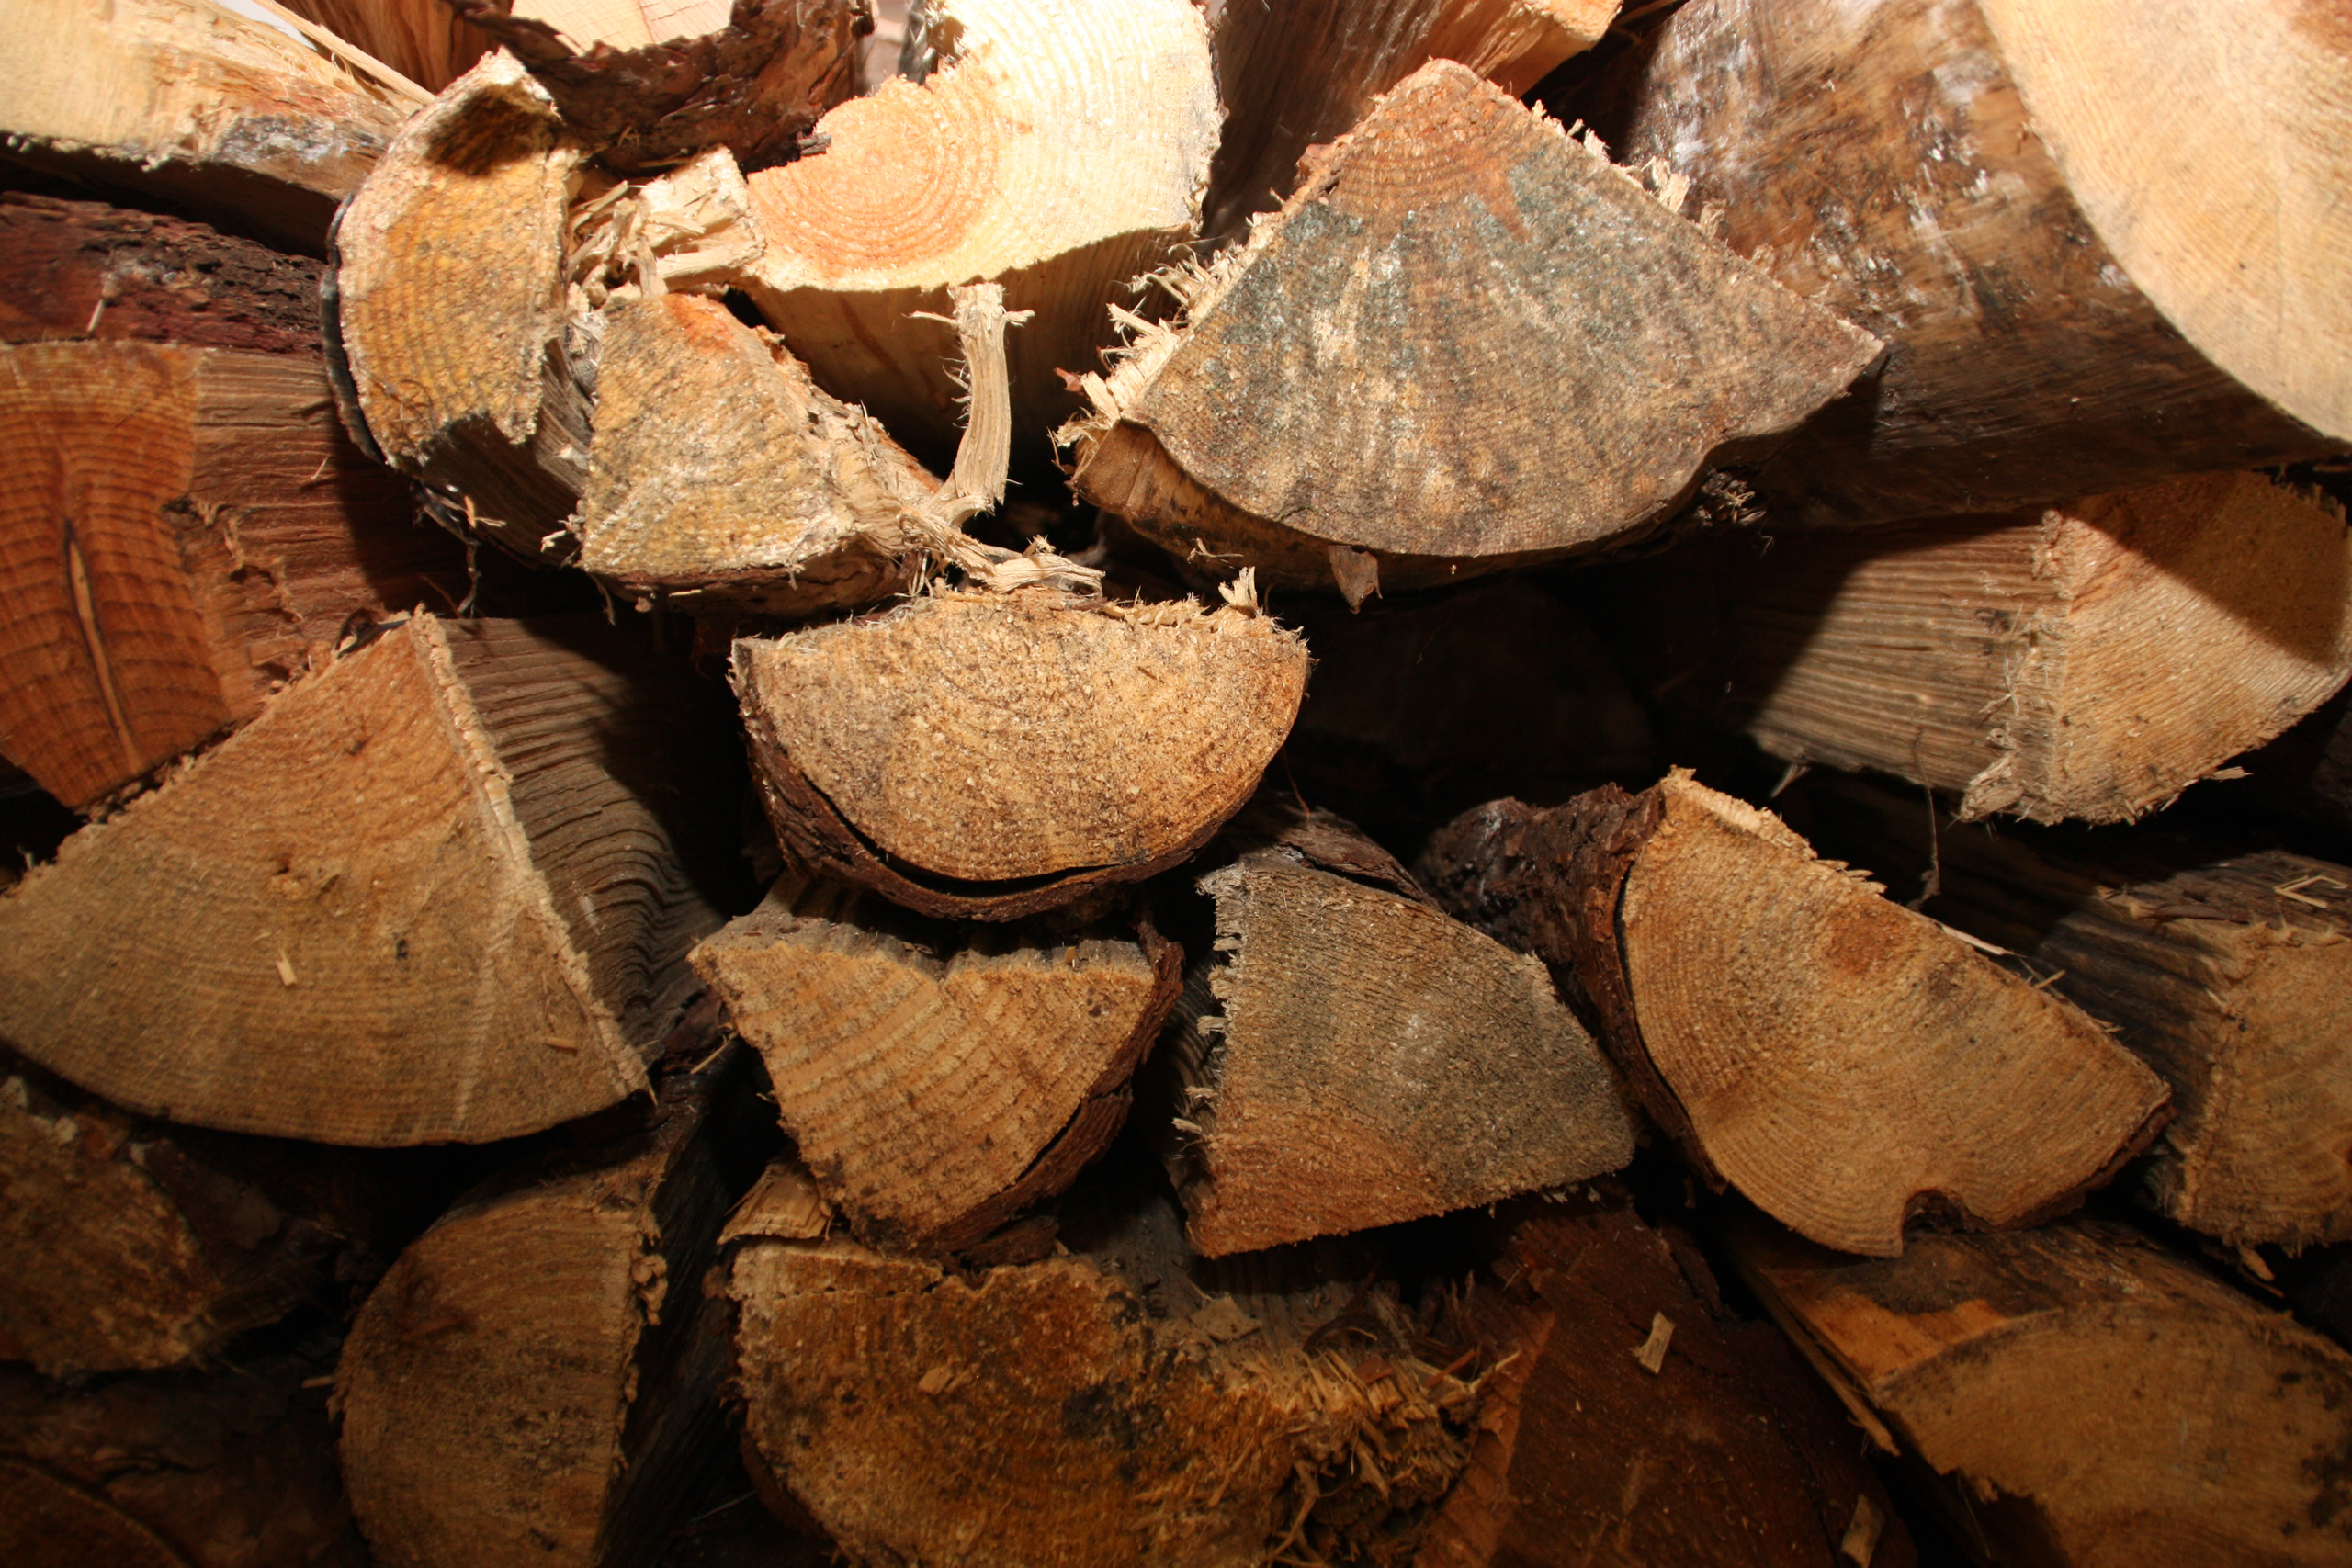 So viel Heizwert steckt im Holz